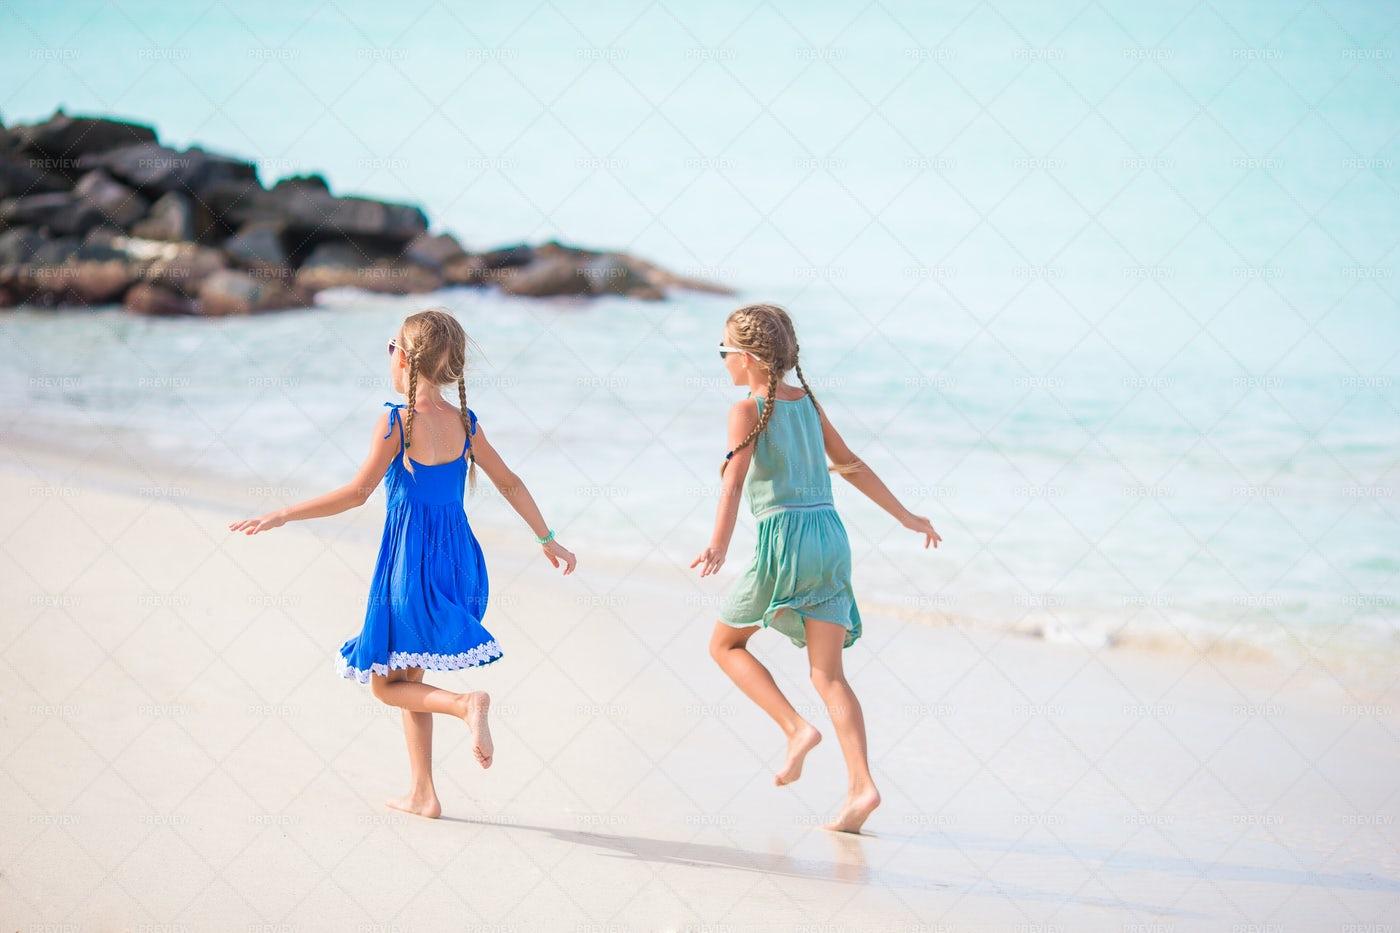 Happy Kids On Beach: Stock Photos